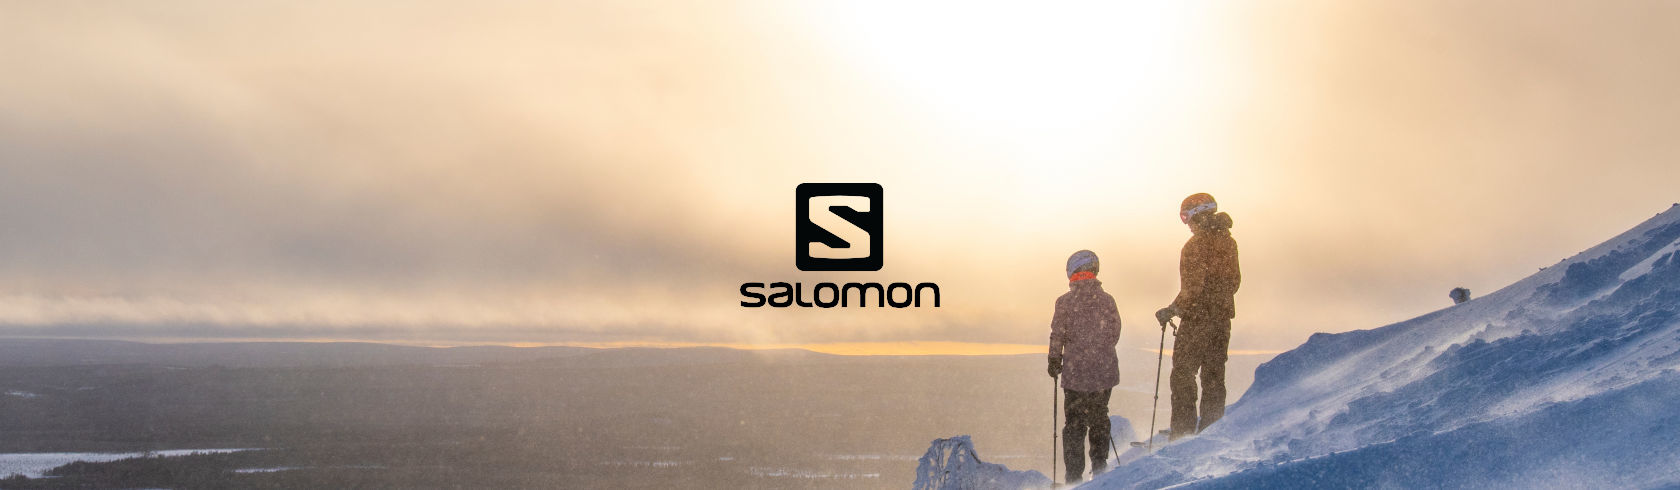 Salomon brand logo